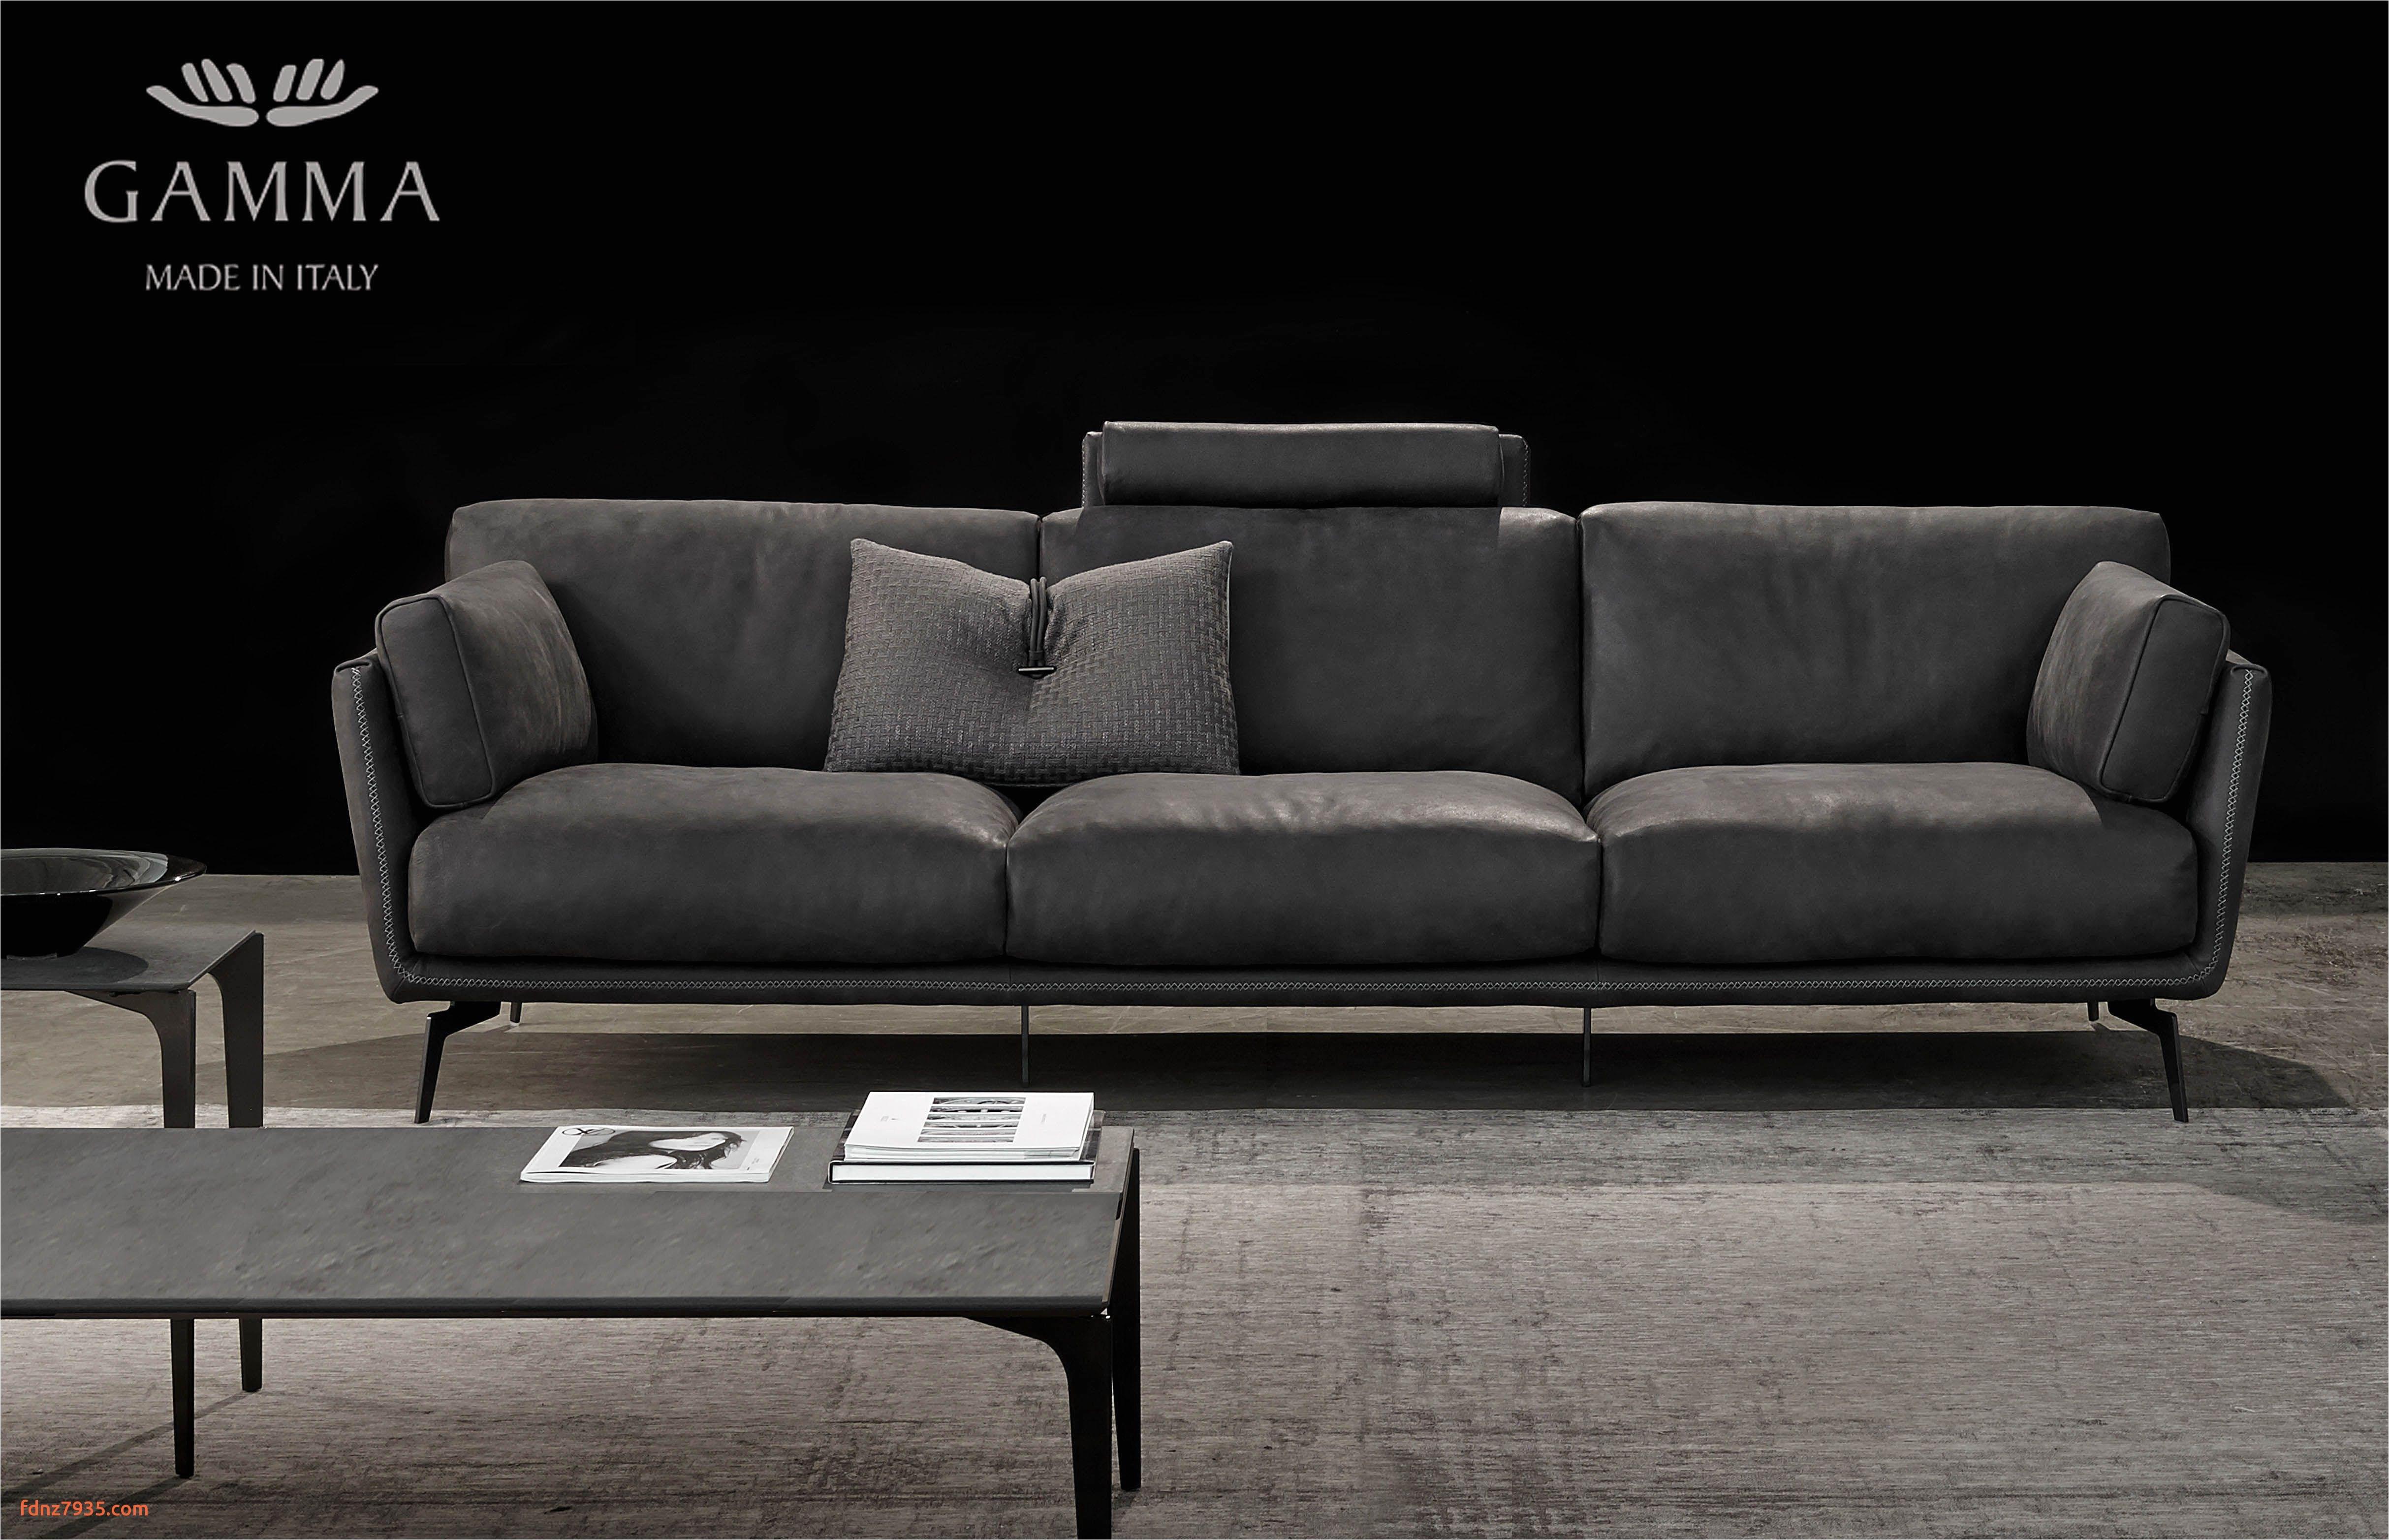 80 Inch Wide Sectional sofa Recliner sofa Covers Fresh sofa Design